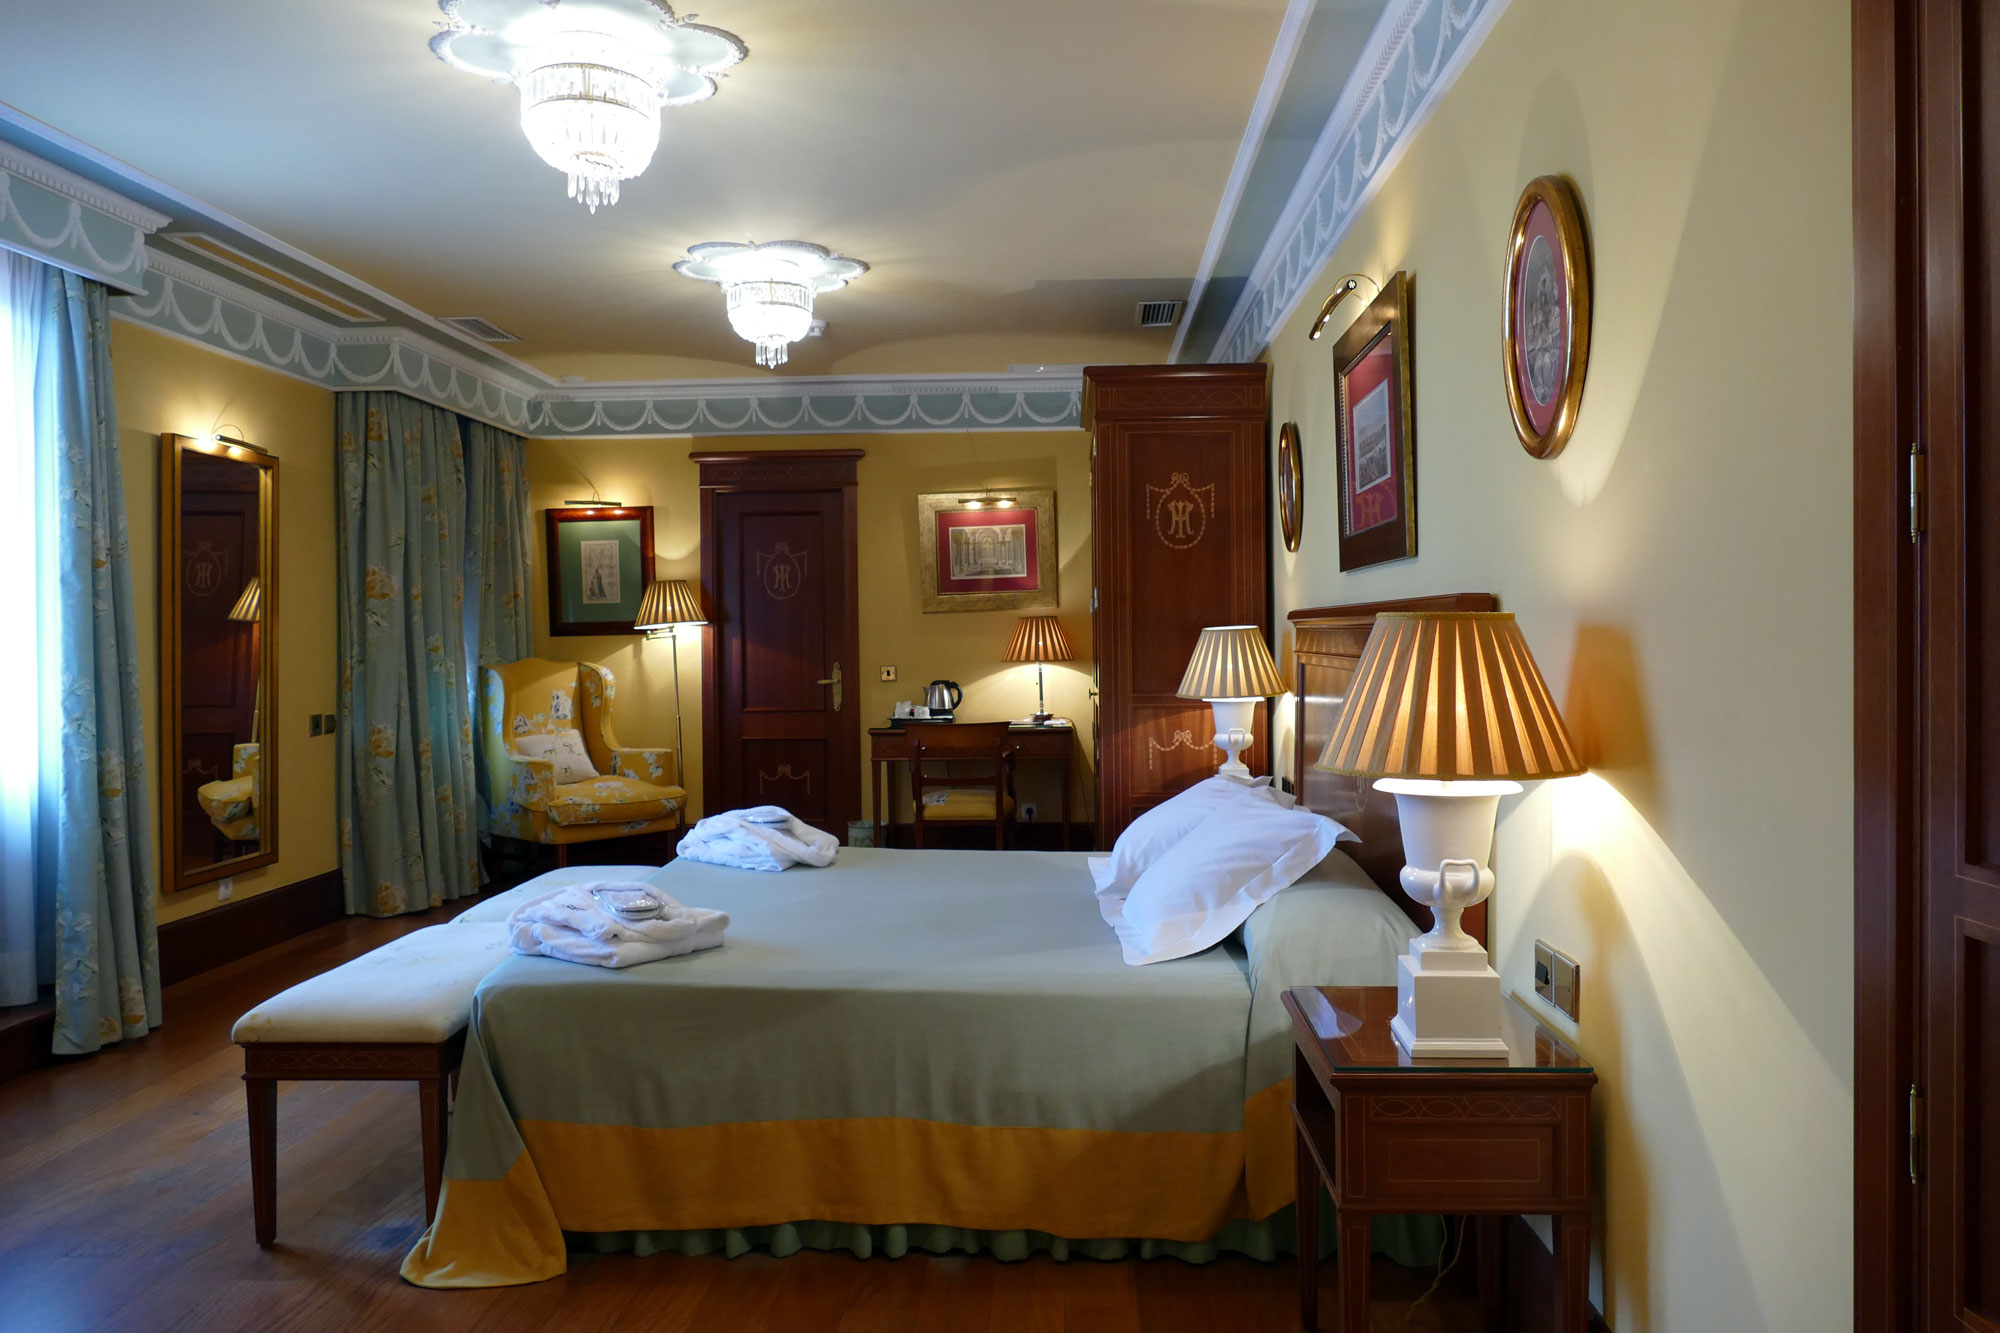 hotel inglaterra sevilla sevillacitycentre.com